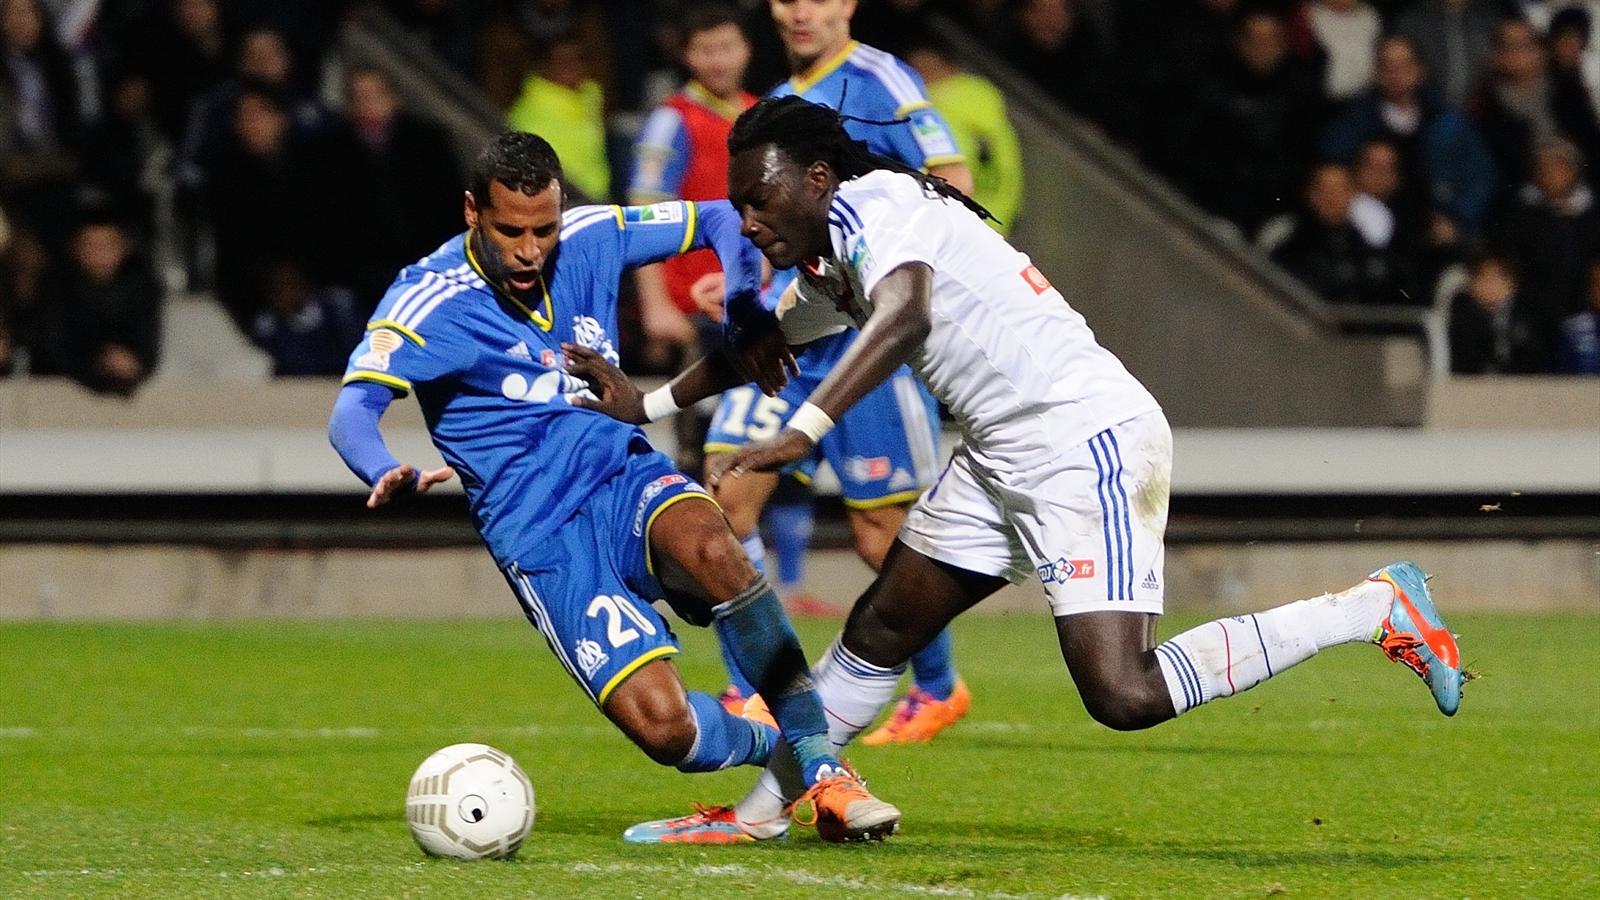 Match Olympique Lyonnais vs Olympique de Marseille en direct live streaming